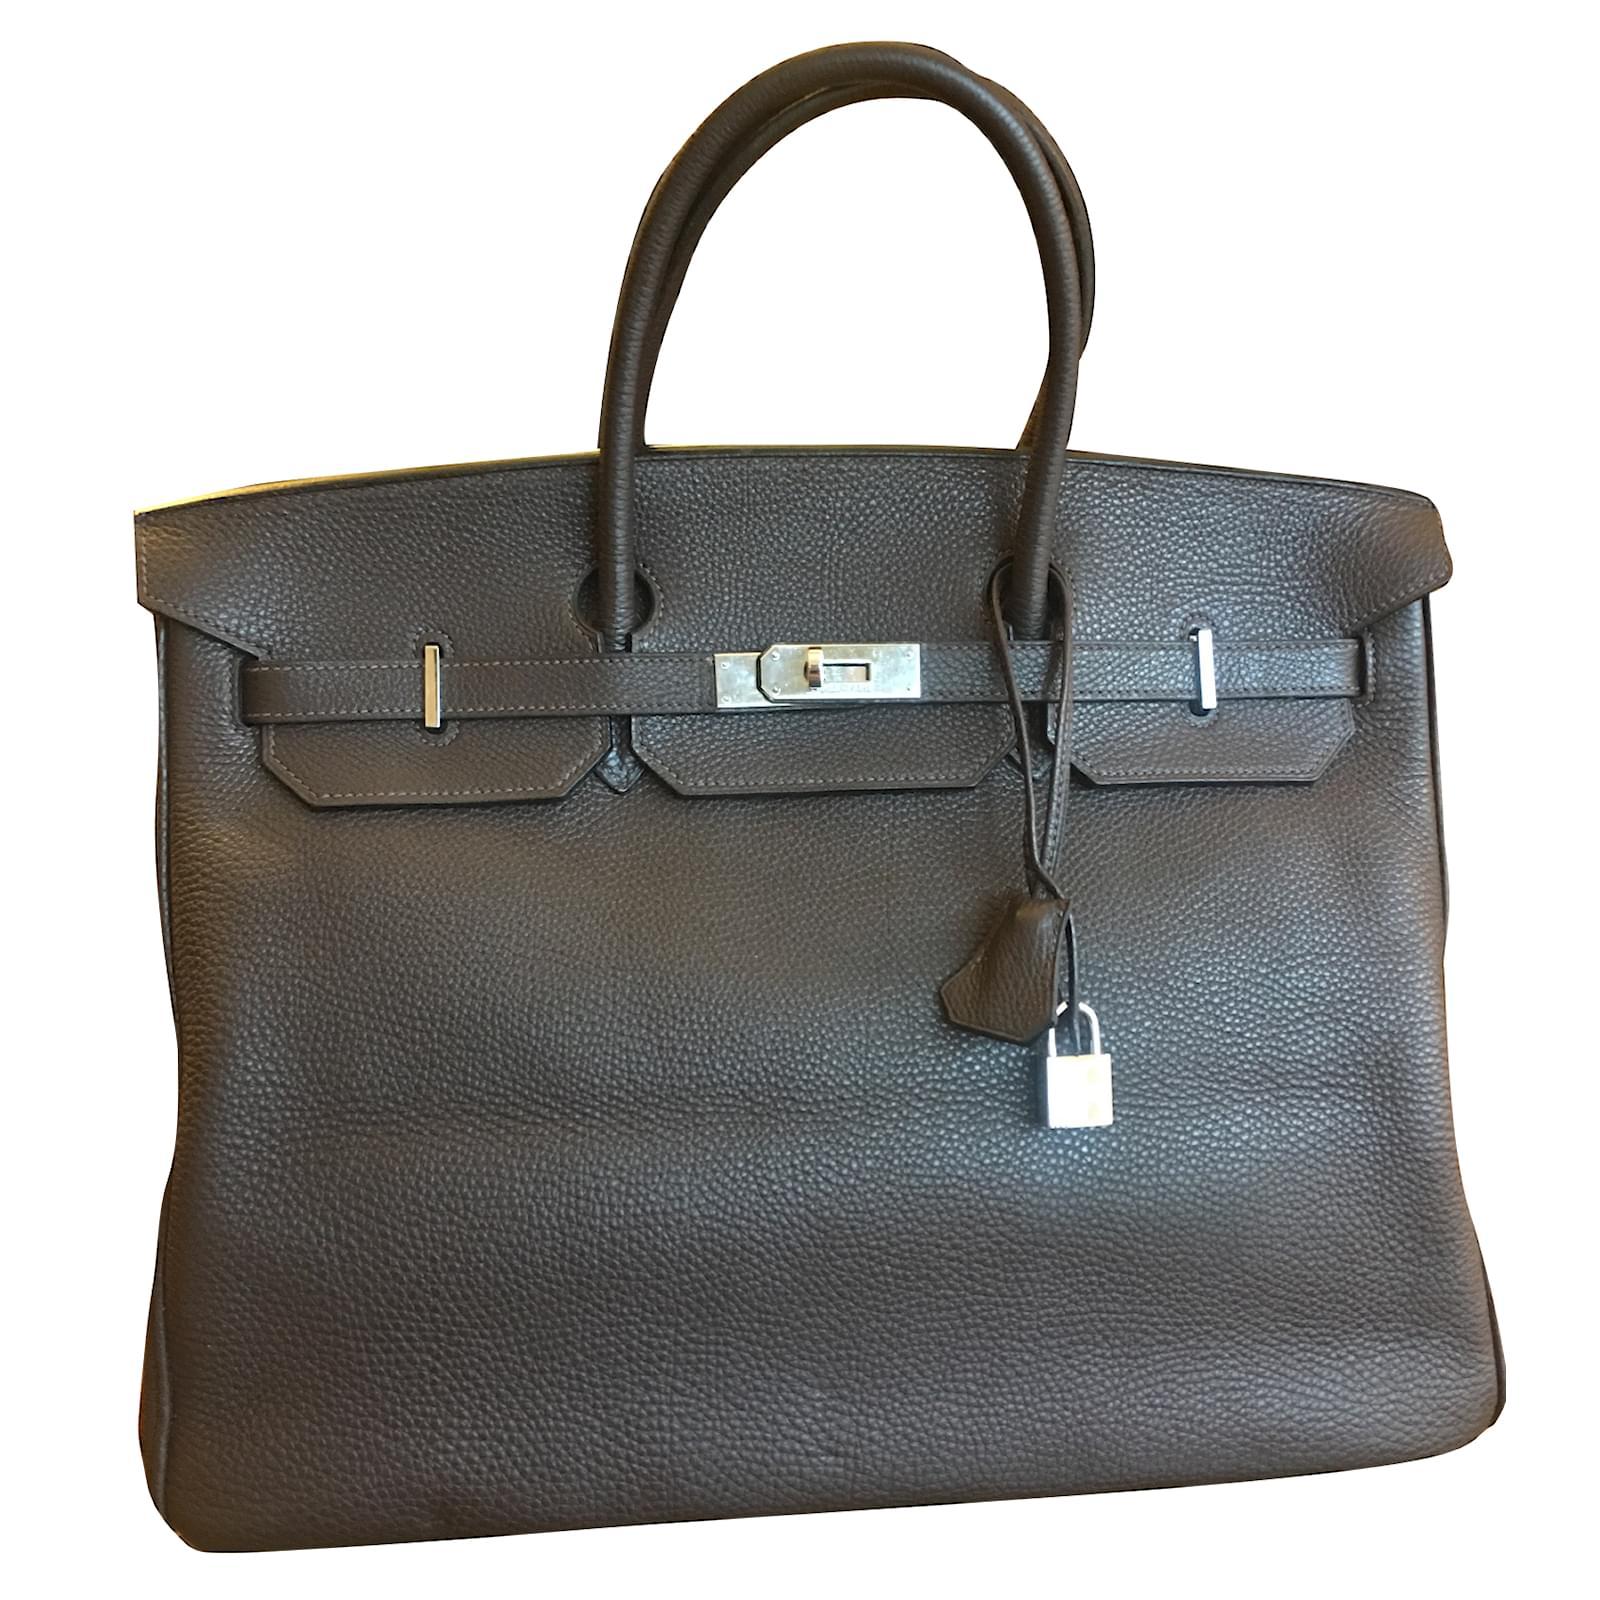 e8a019a24b Sacs à main Hermès BIRKIN 40cm Cuir Marron ref.33371 - Joli Closet